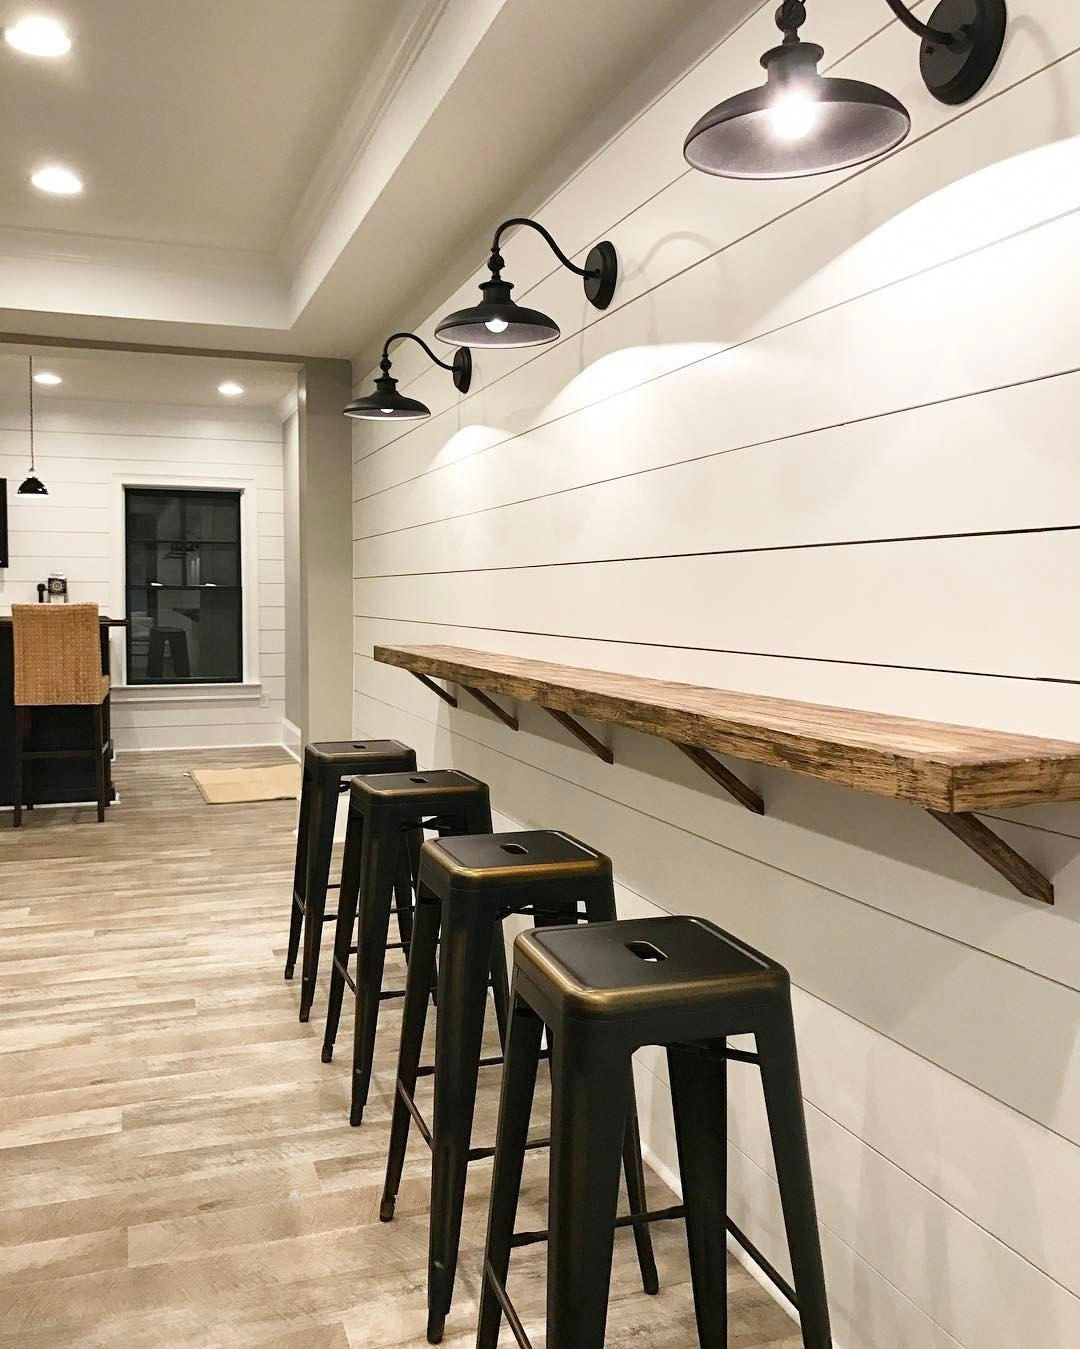 Basement Bedroom Ideas On A Budget | Open Ceiling Basement ...